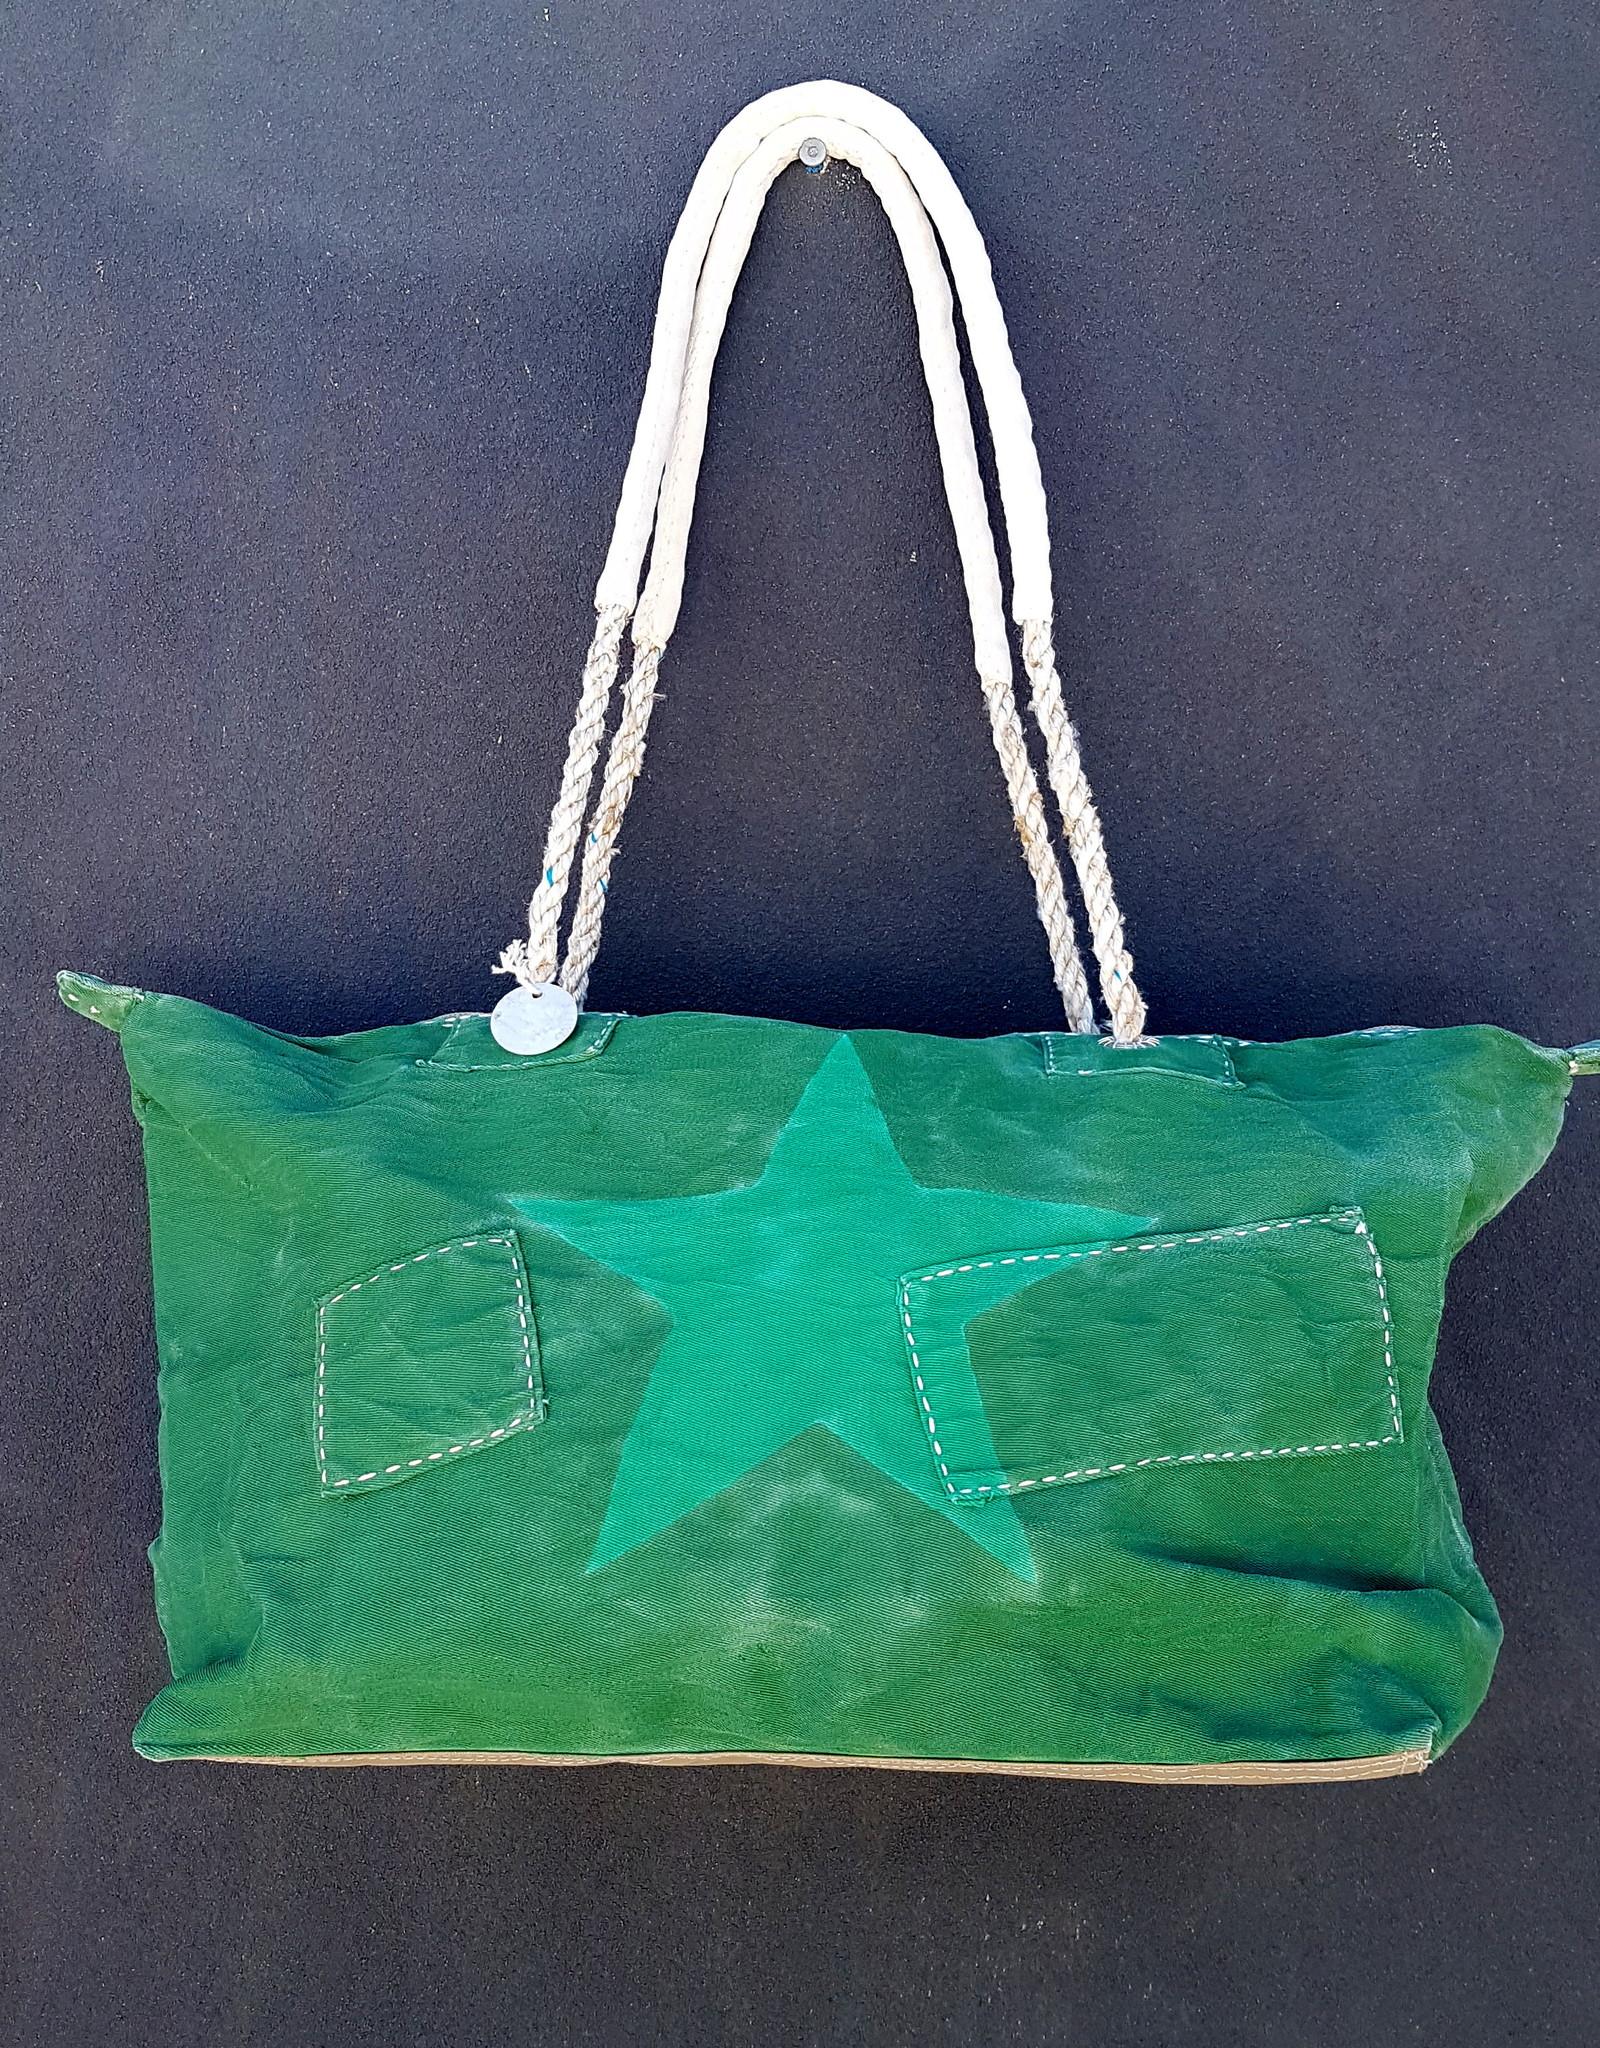 ALI LAMU LARGE WEEKEND BAG EMERALD GREEN STAR